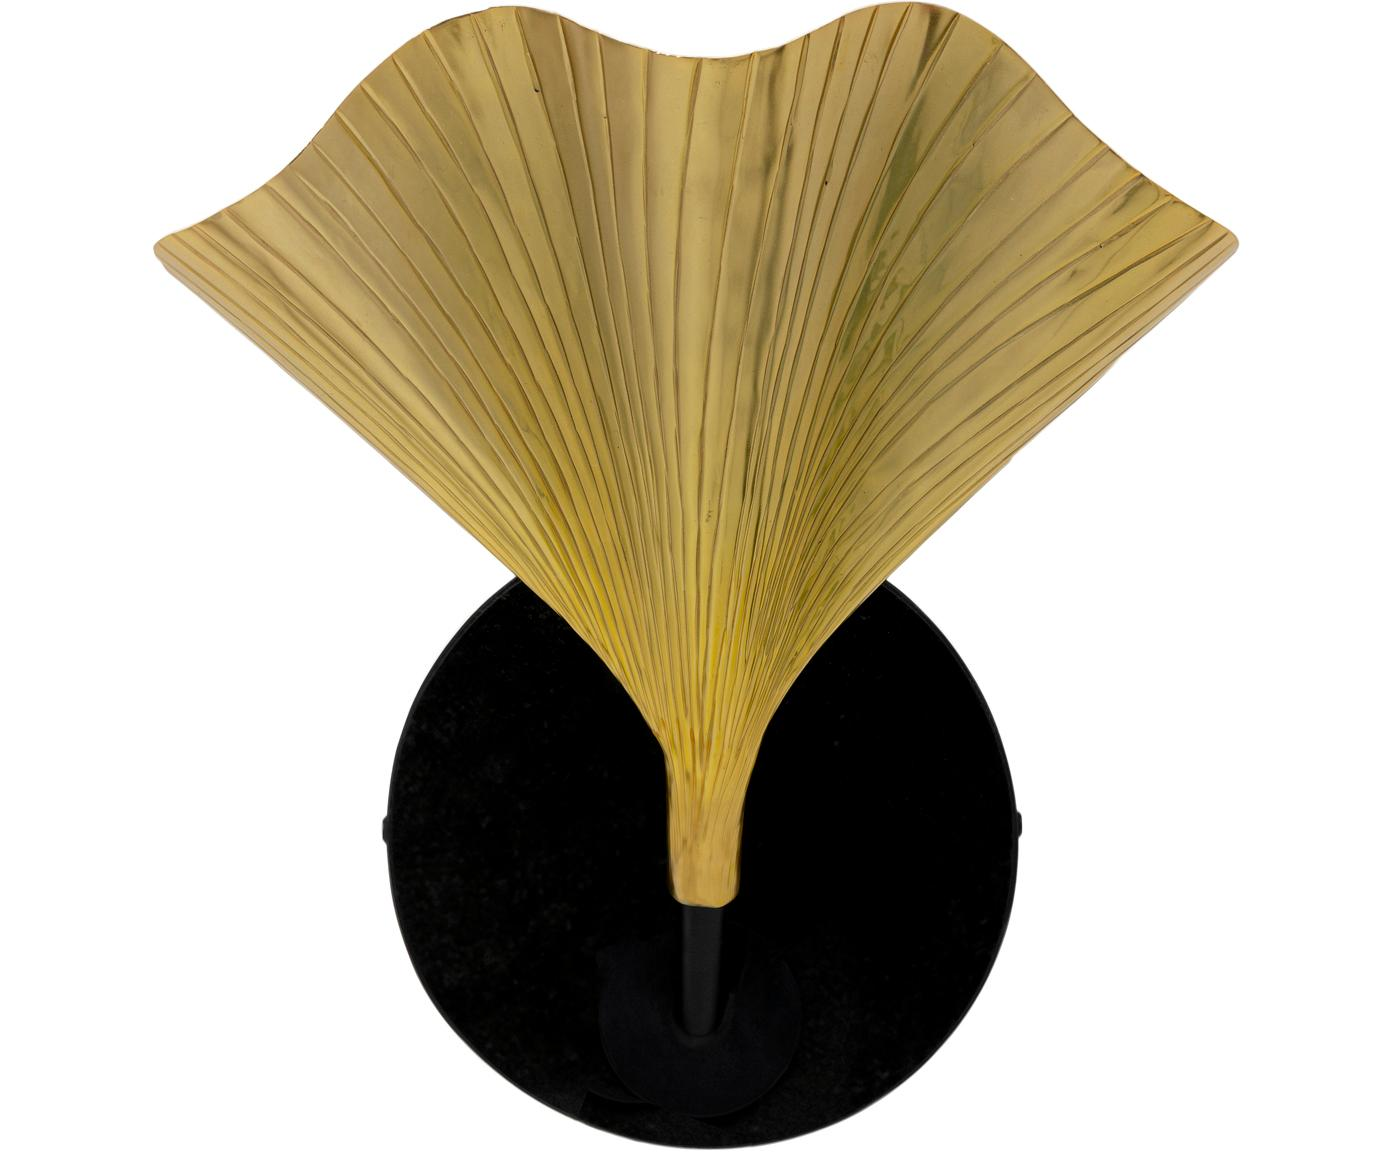 Wandlamp Ginkgo met marmeren bevestiging, Lampenkap: gelakt aluminium, Goudkleurig, zwart, 30 x 33 cm